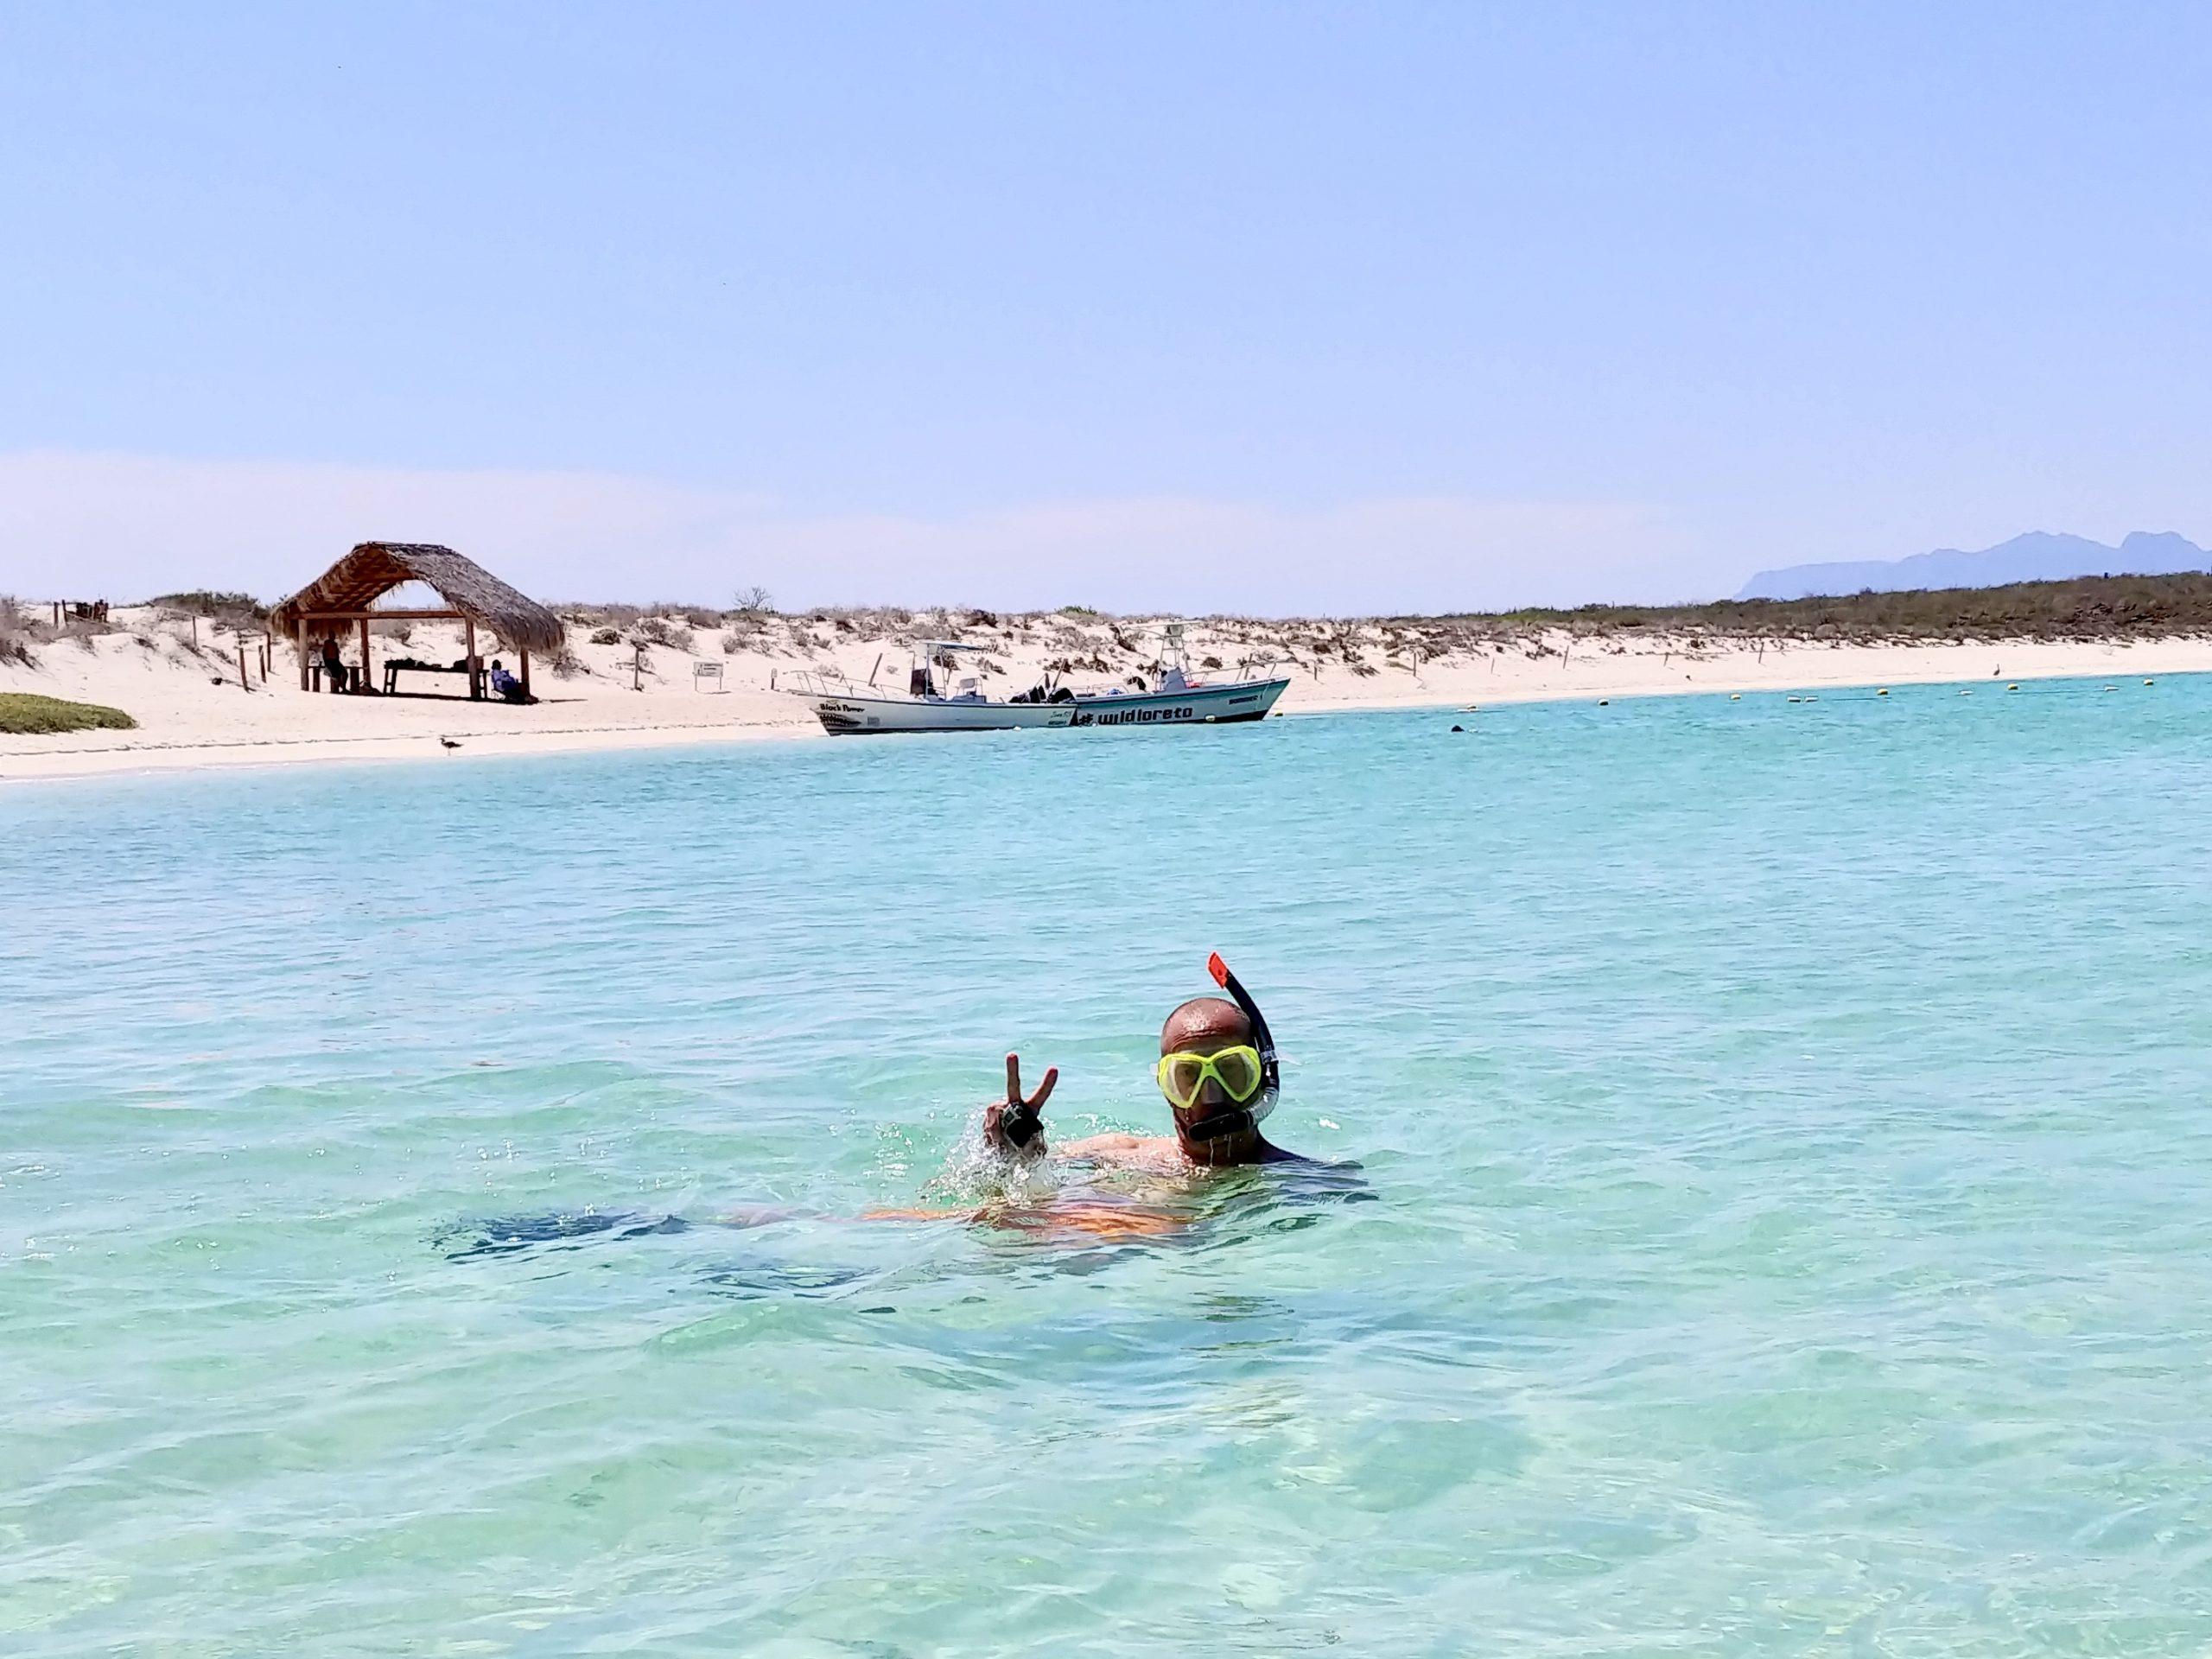 man snorkels off the beaches of Isla Coronado in Loreto, Mexico